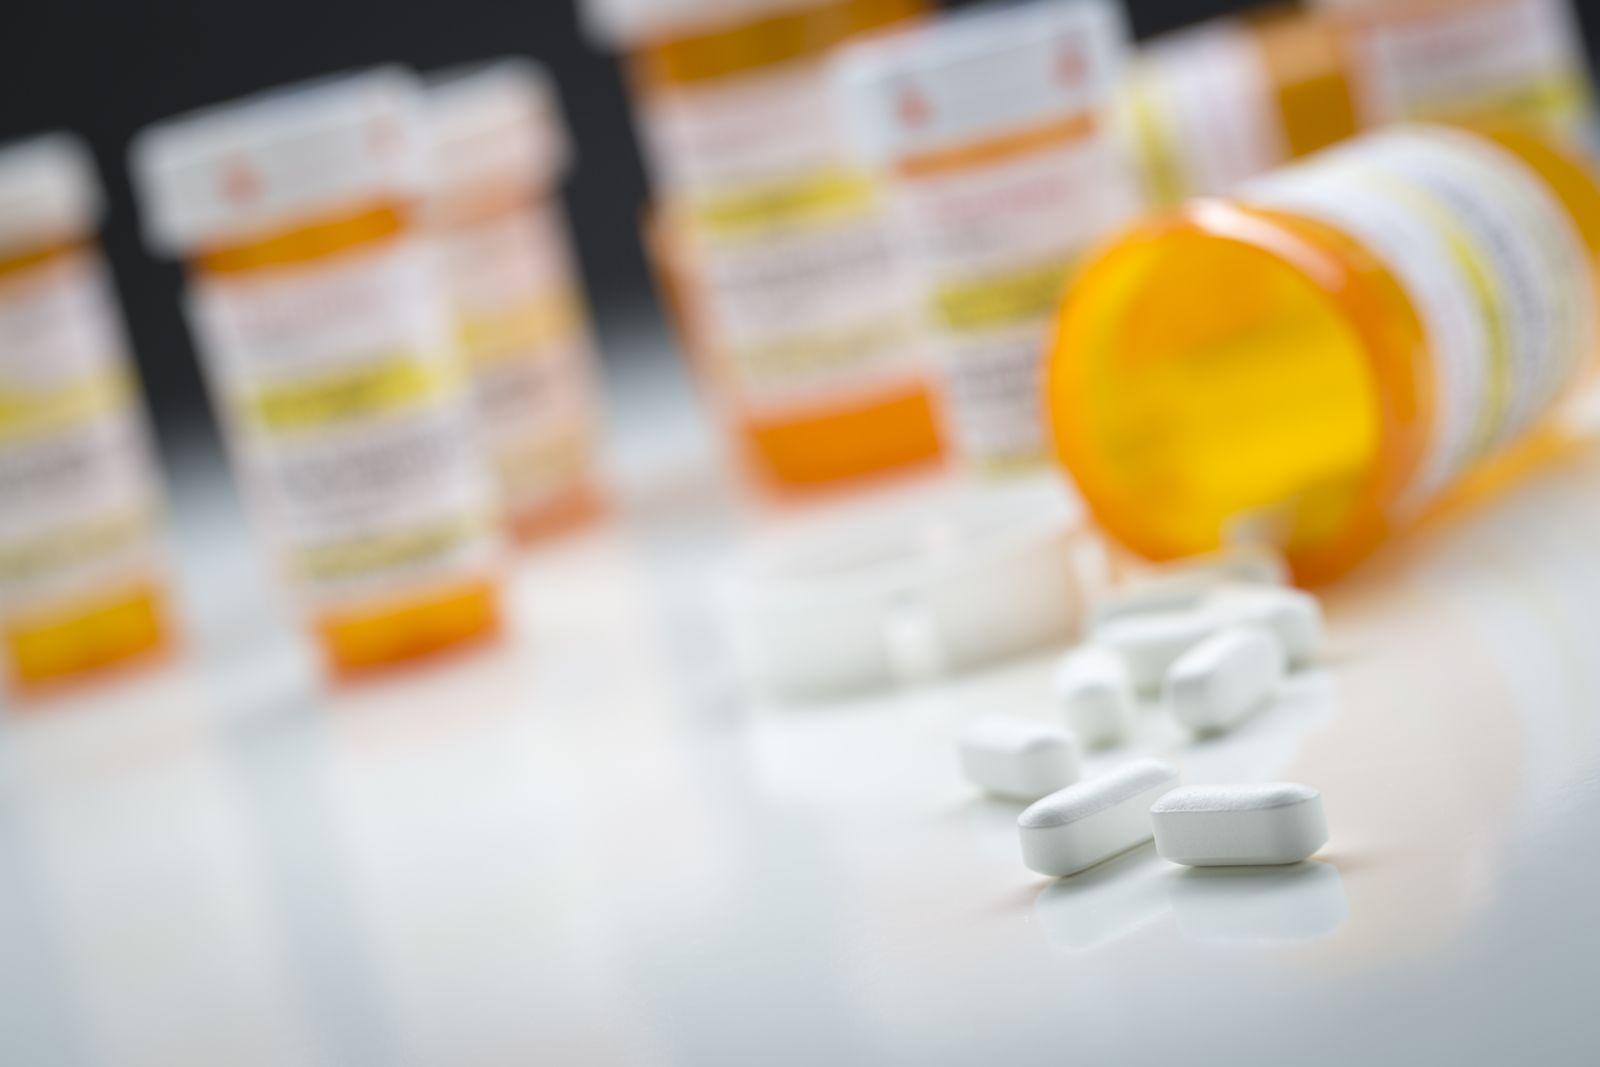 Prescription bottles, abuse of antipsychotic drugs in nursing homes